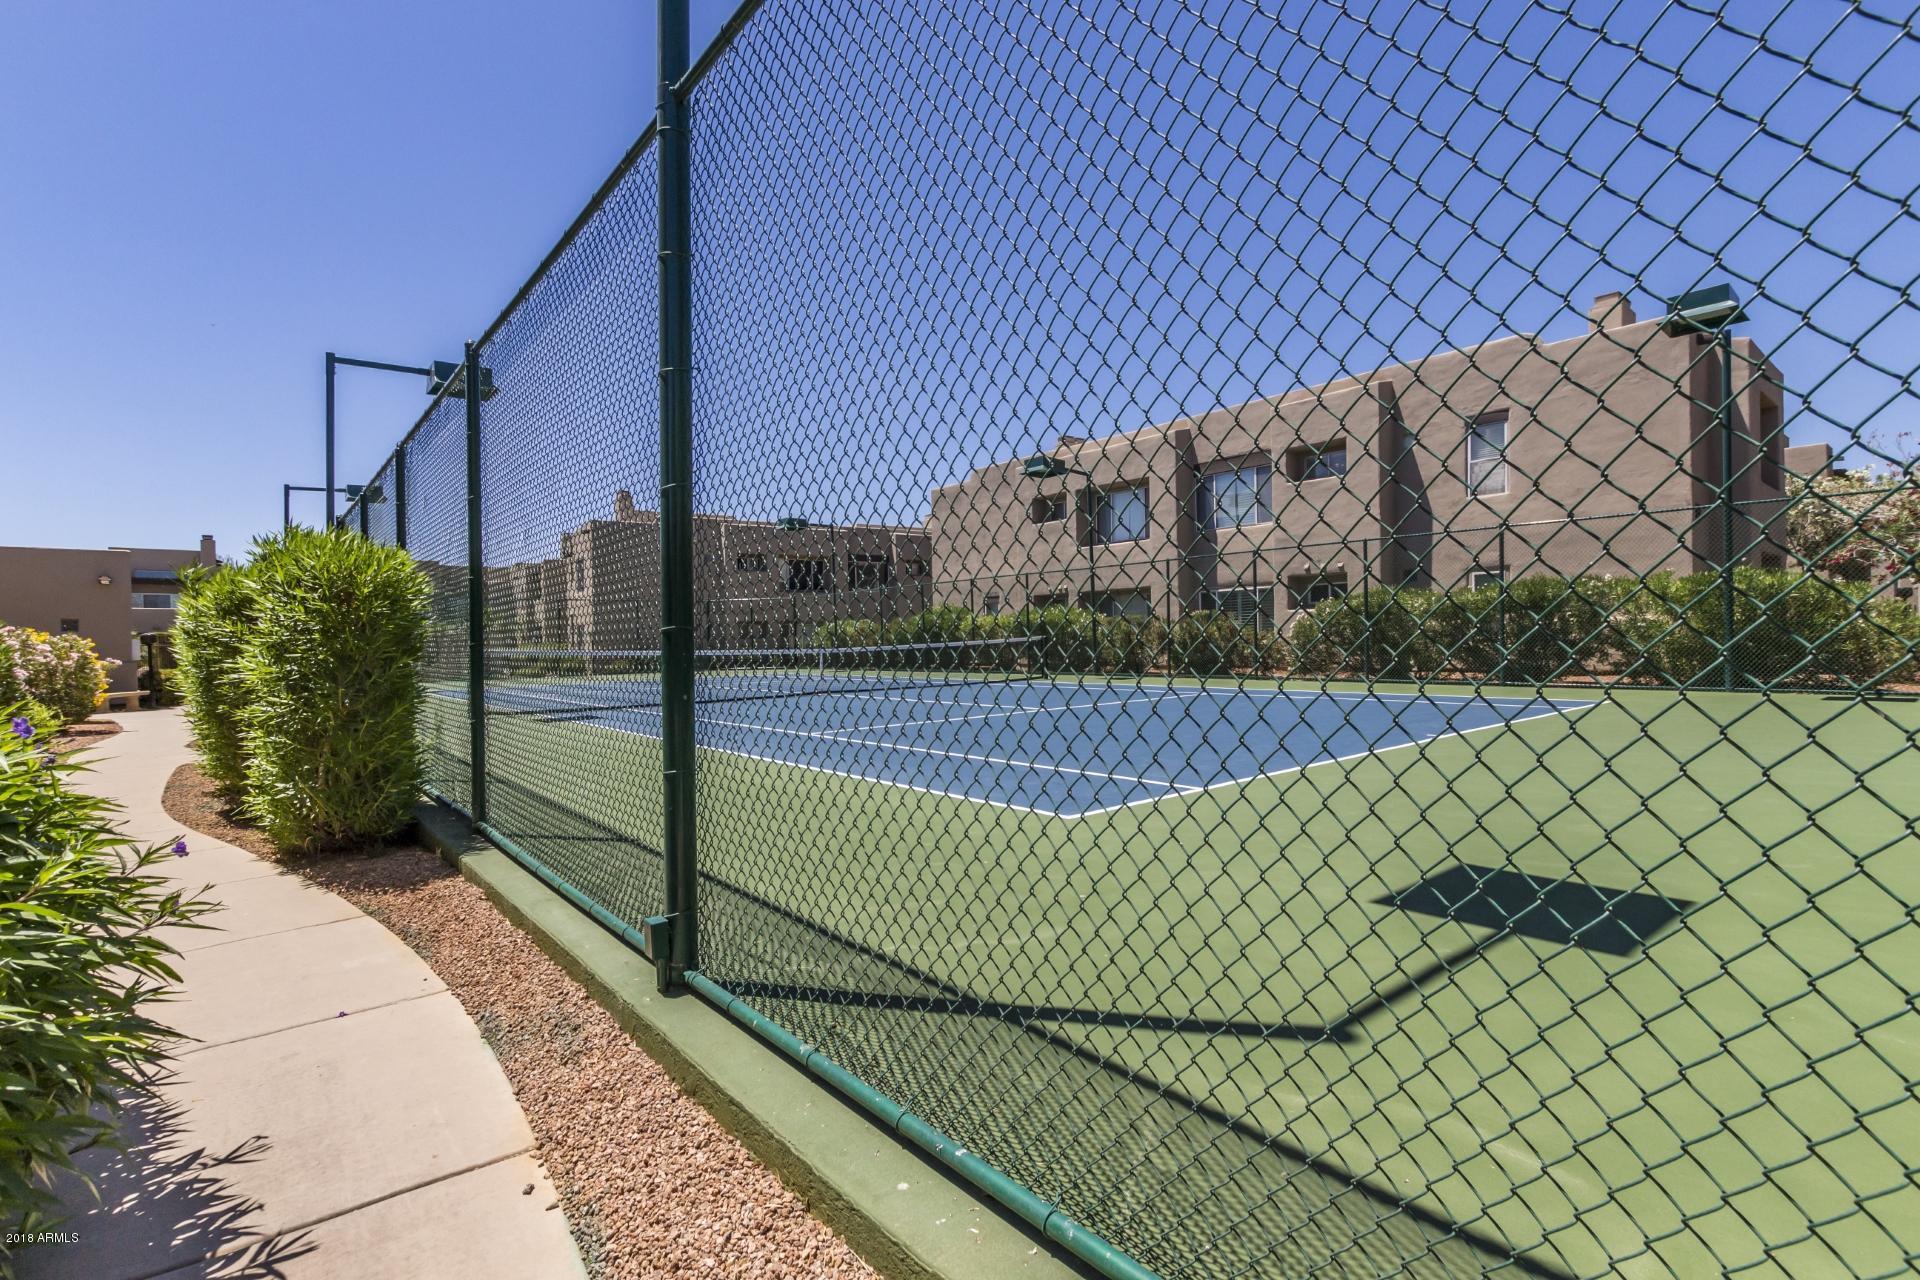 MLS 5877752 11260 N 92ND Street Unit 1010 Building 4, Scottsdale, AZ 85260 Scottsdale AZ Scottsdale Airpark Area